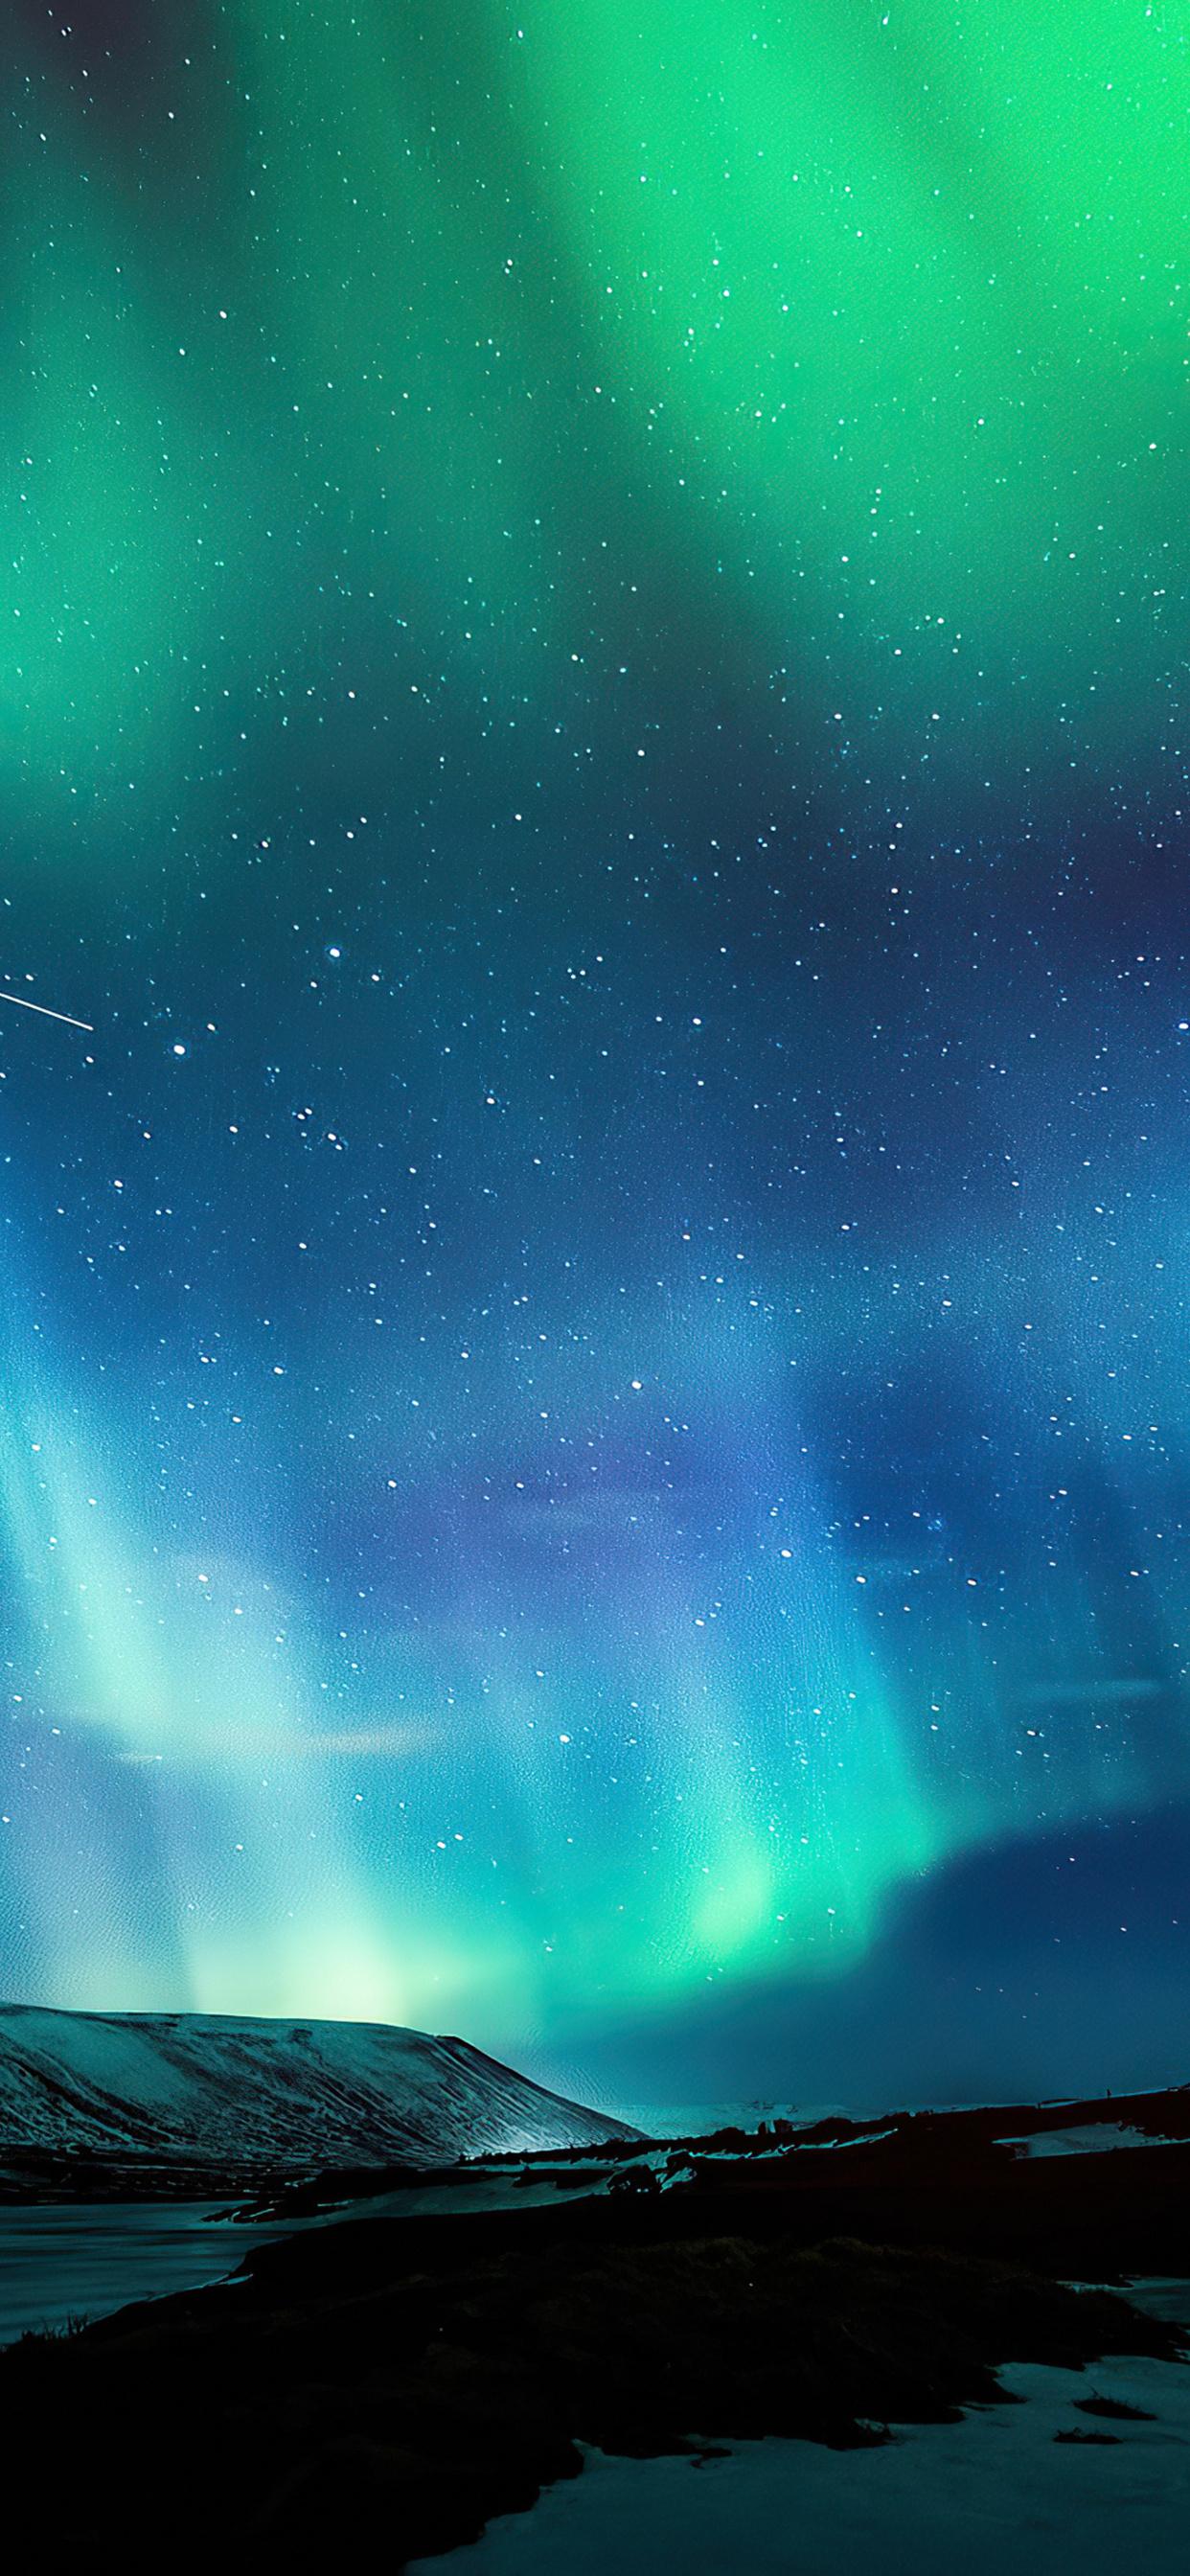 1242x2688 Aurora Borealis Northern Lights 4k Iphone XS MAX ...